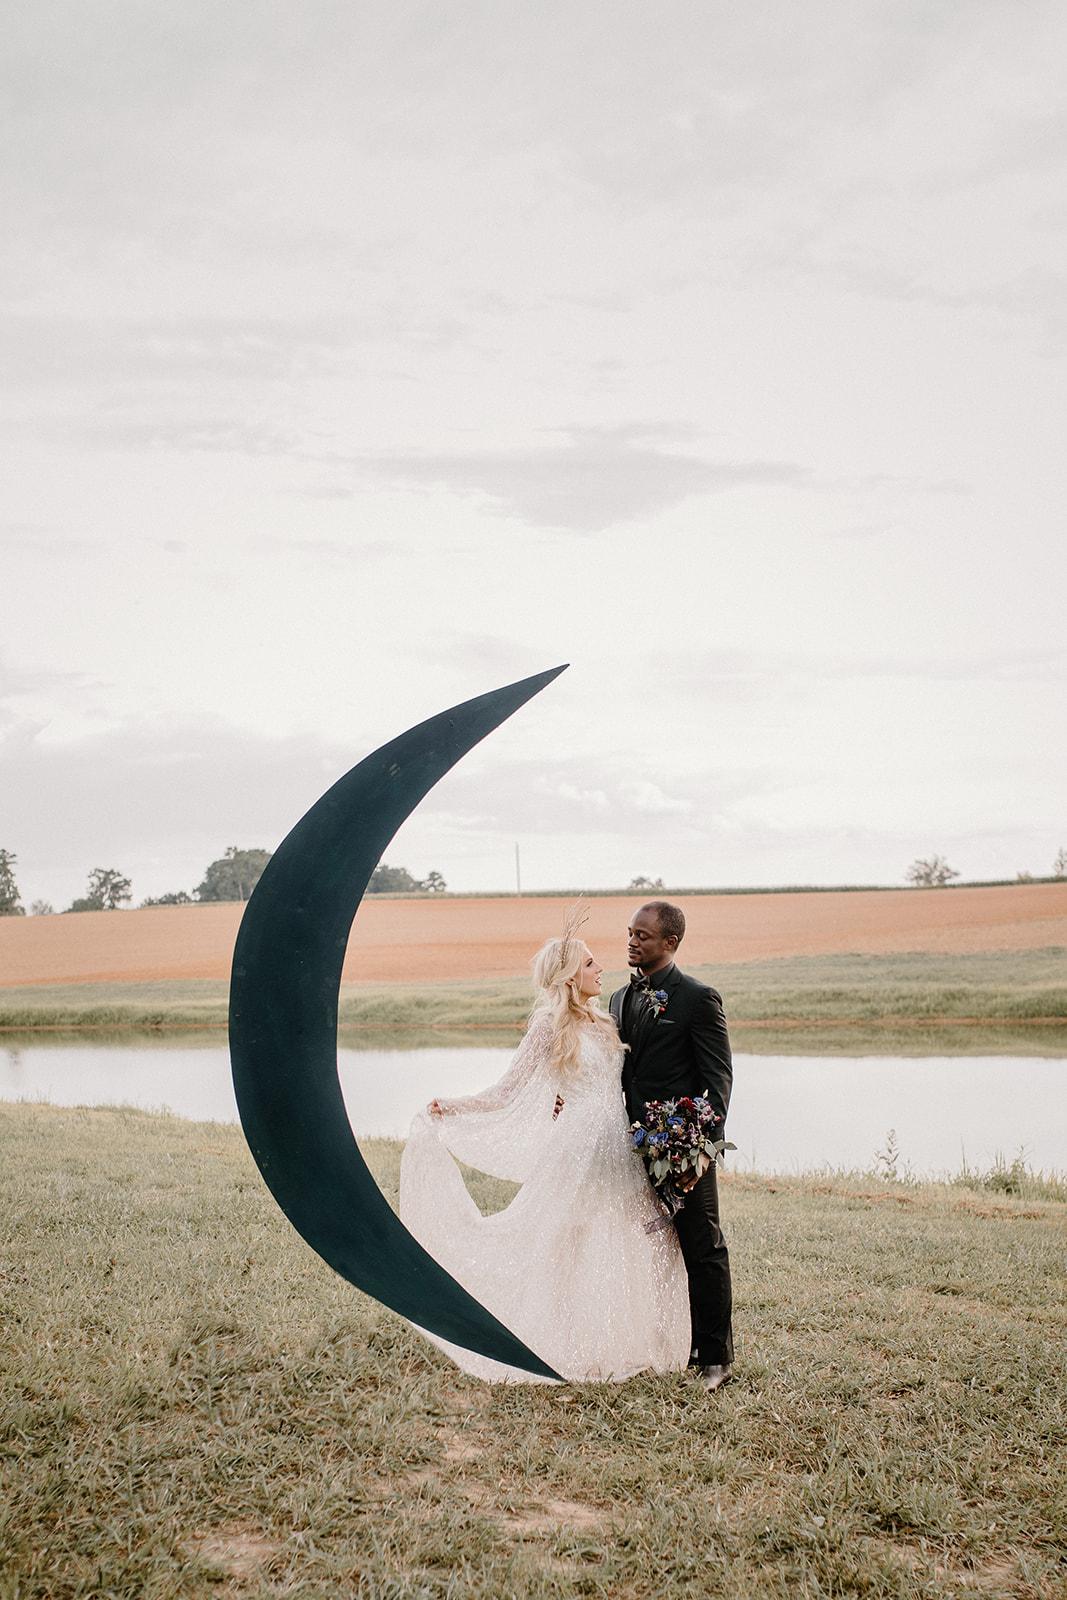 Moon celestial wedding decor